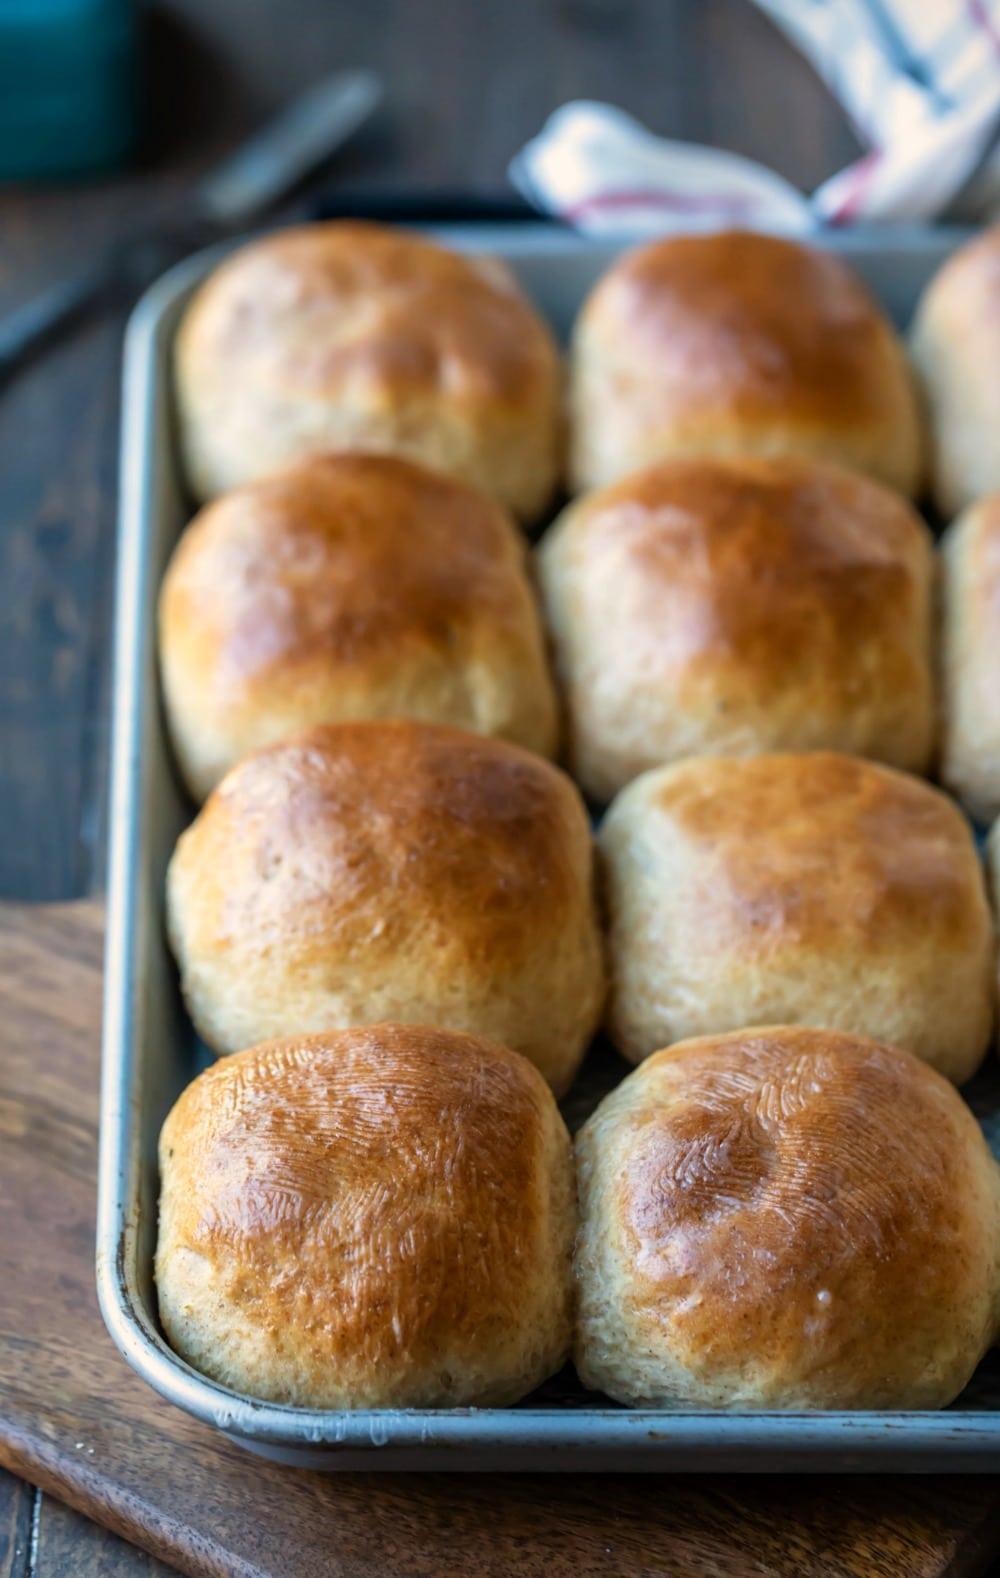 30 minute honey wheat rolls on a rimmed baking sheet